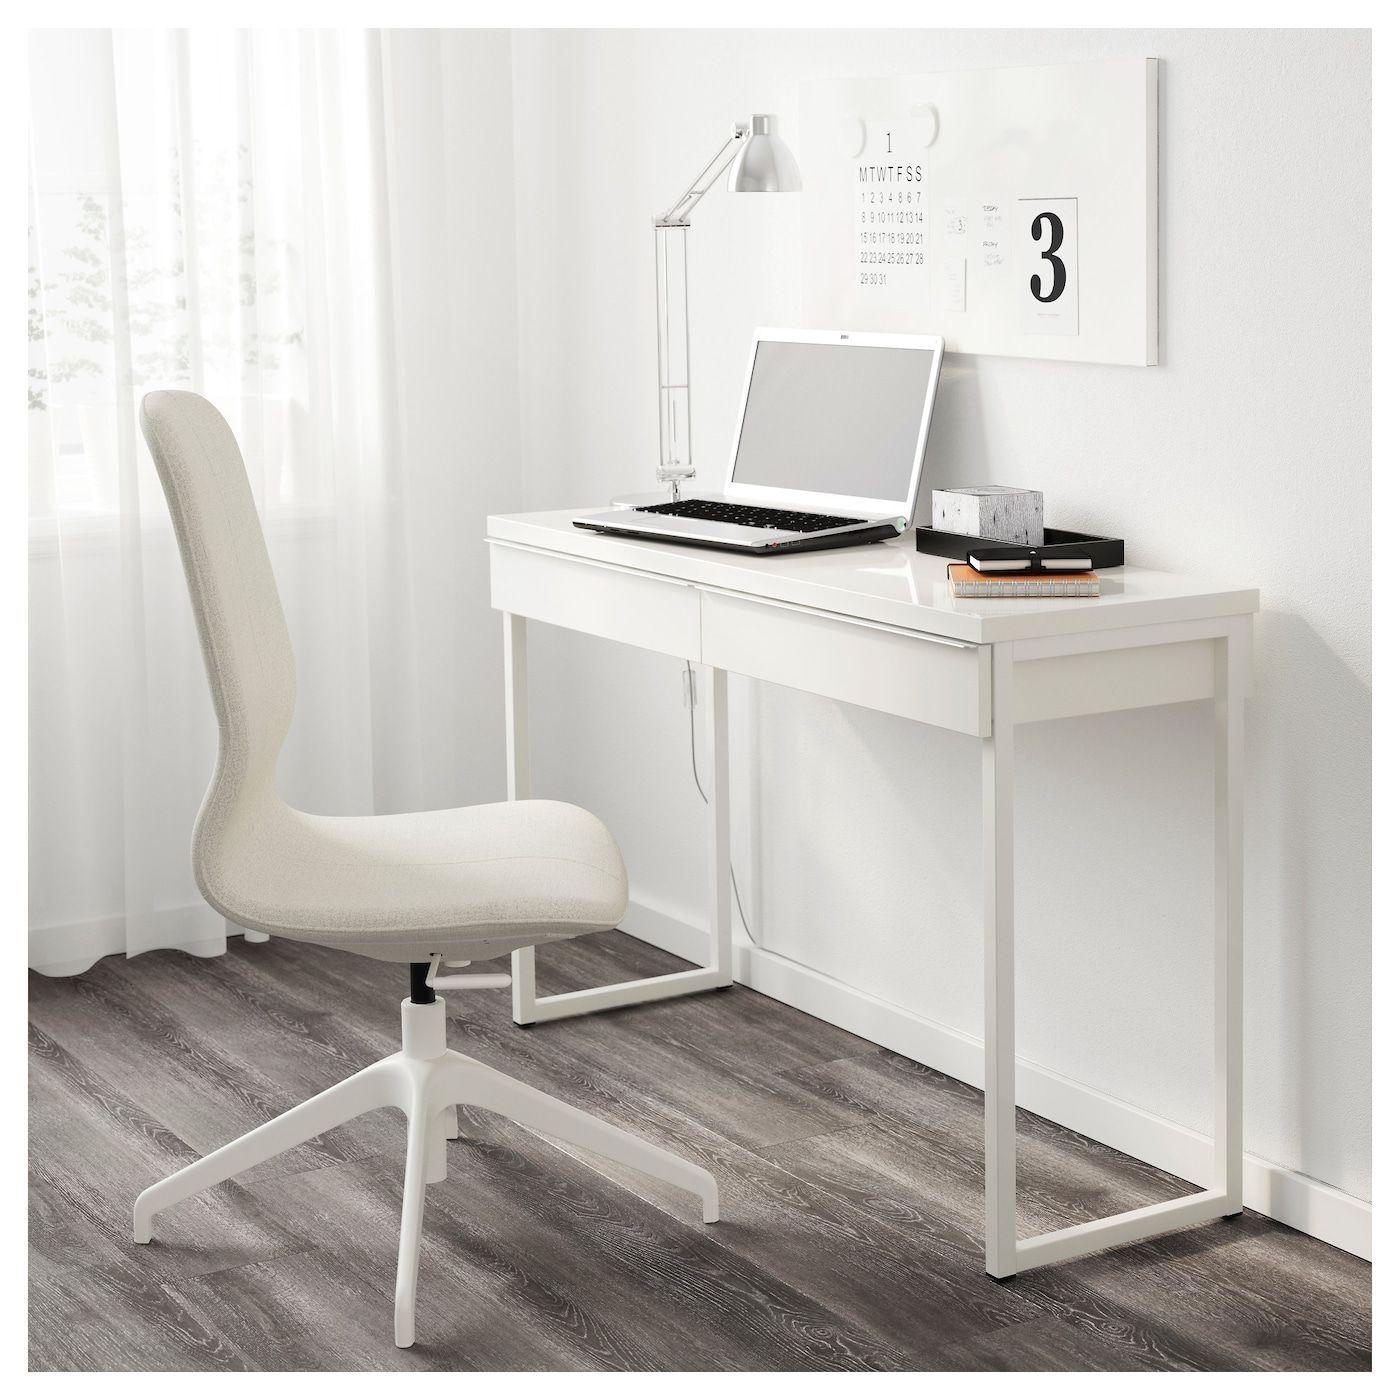 Besta Burs Desk High Gloss White 47 1 4x15 3 4 Ikea Ikea White Desk Home Office Furniture High Gloss White